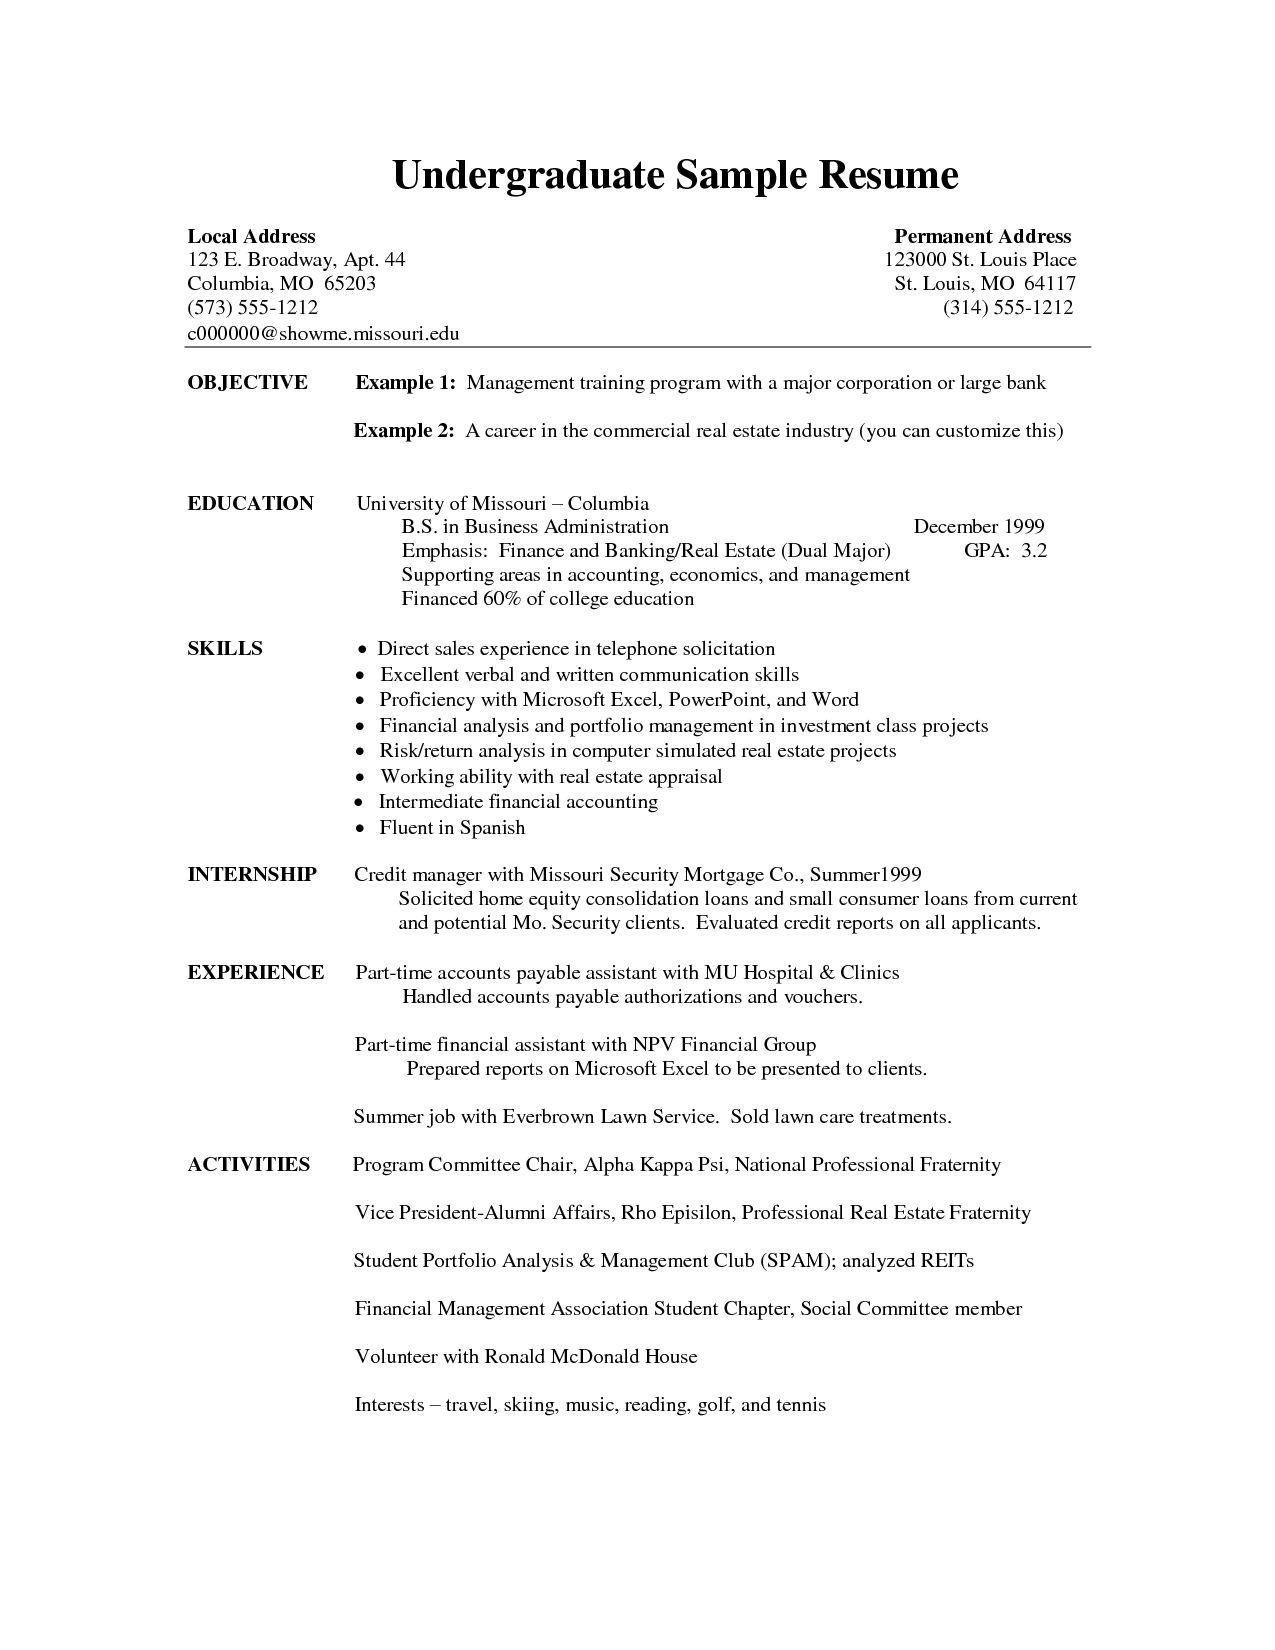 Undergraduate Student Resume Template Word